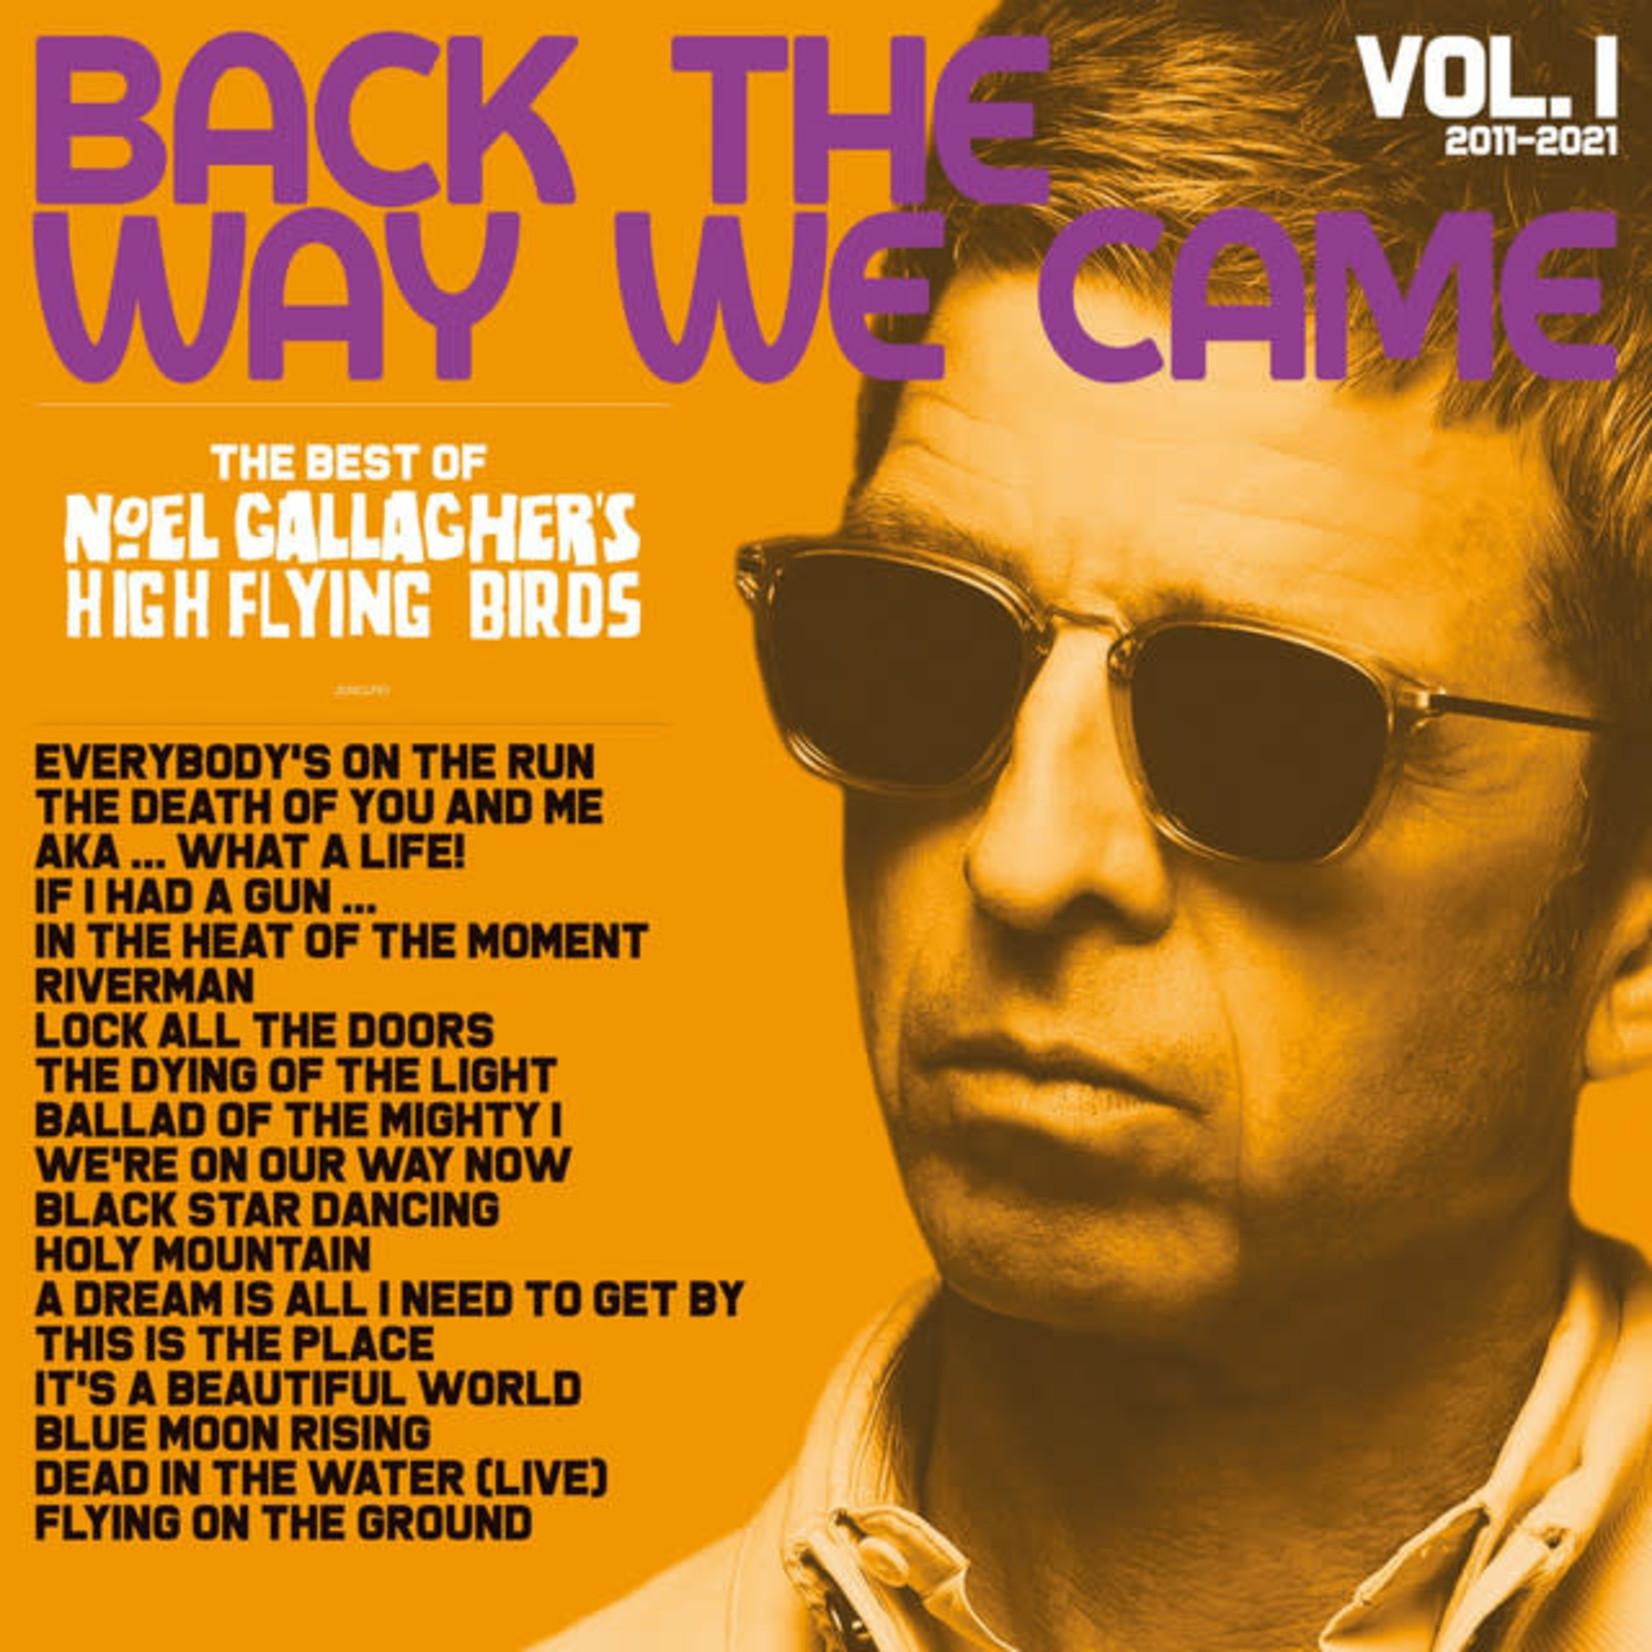 Vinyl Noel Gallagher's High Flying Birds - Back The Way We Came (Best of Volume 1)